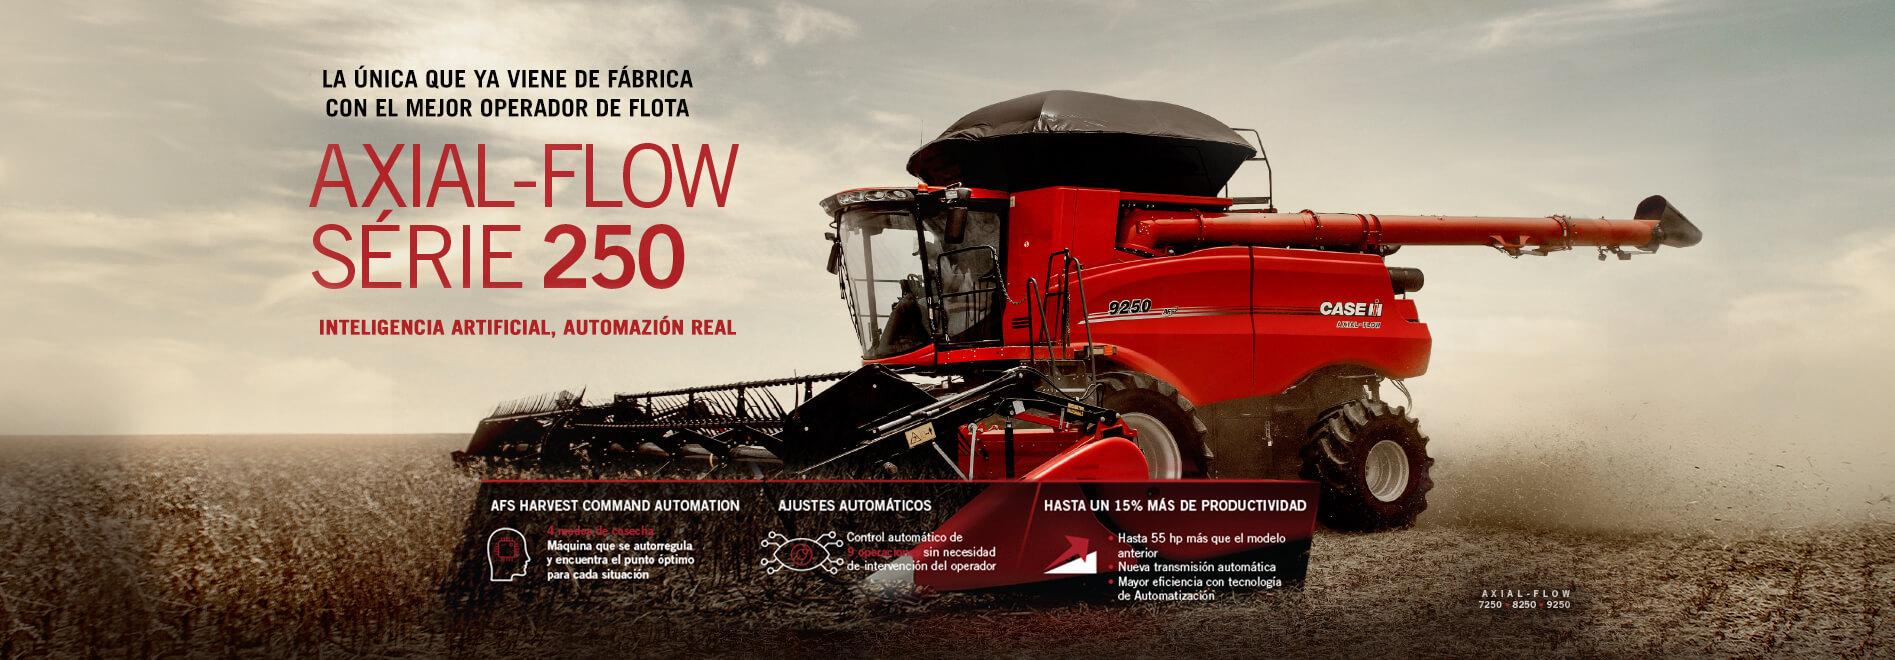 Axial-Flow Série 250